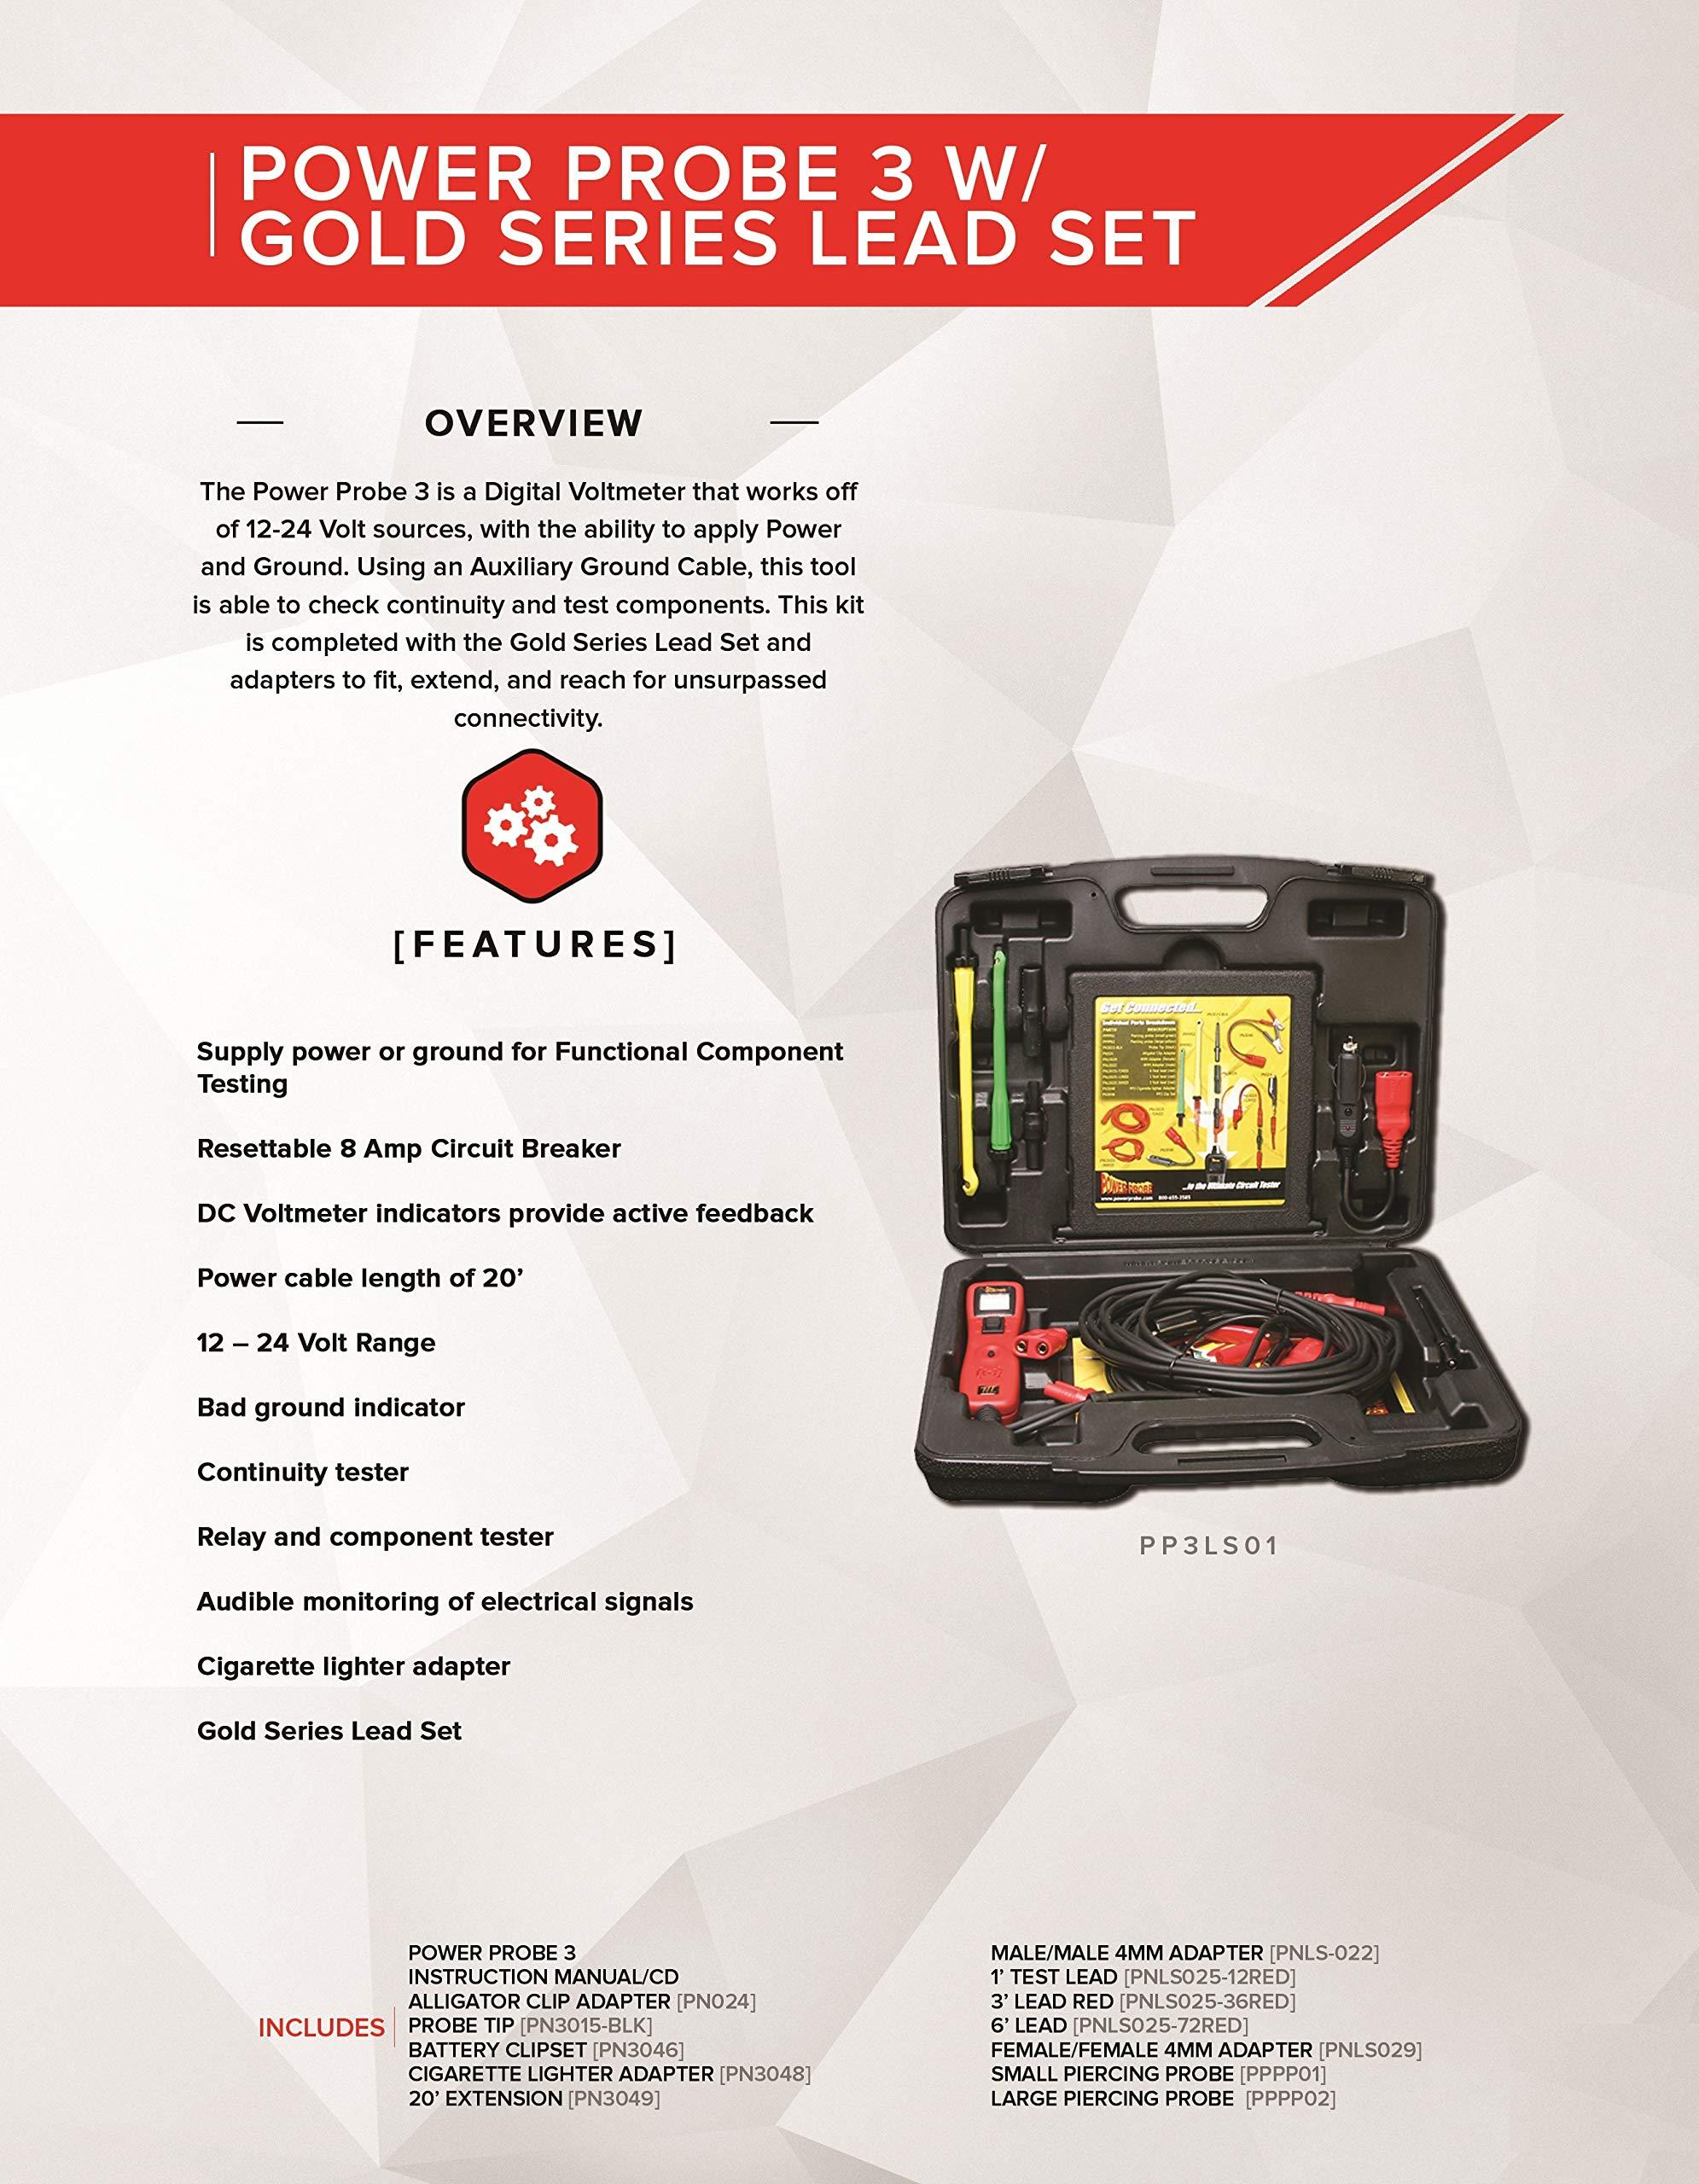 Power Probe Iii Circuit Tester W Lead Set Kit Pp3ls01 Car Digital Voltmeter Diagnostic Test Tool